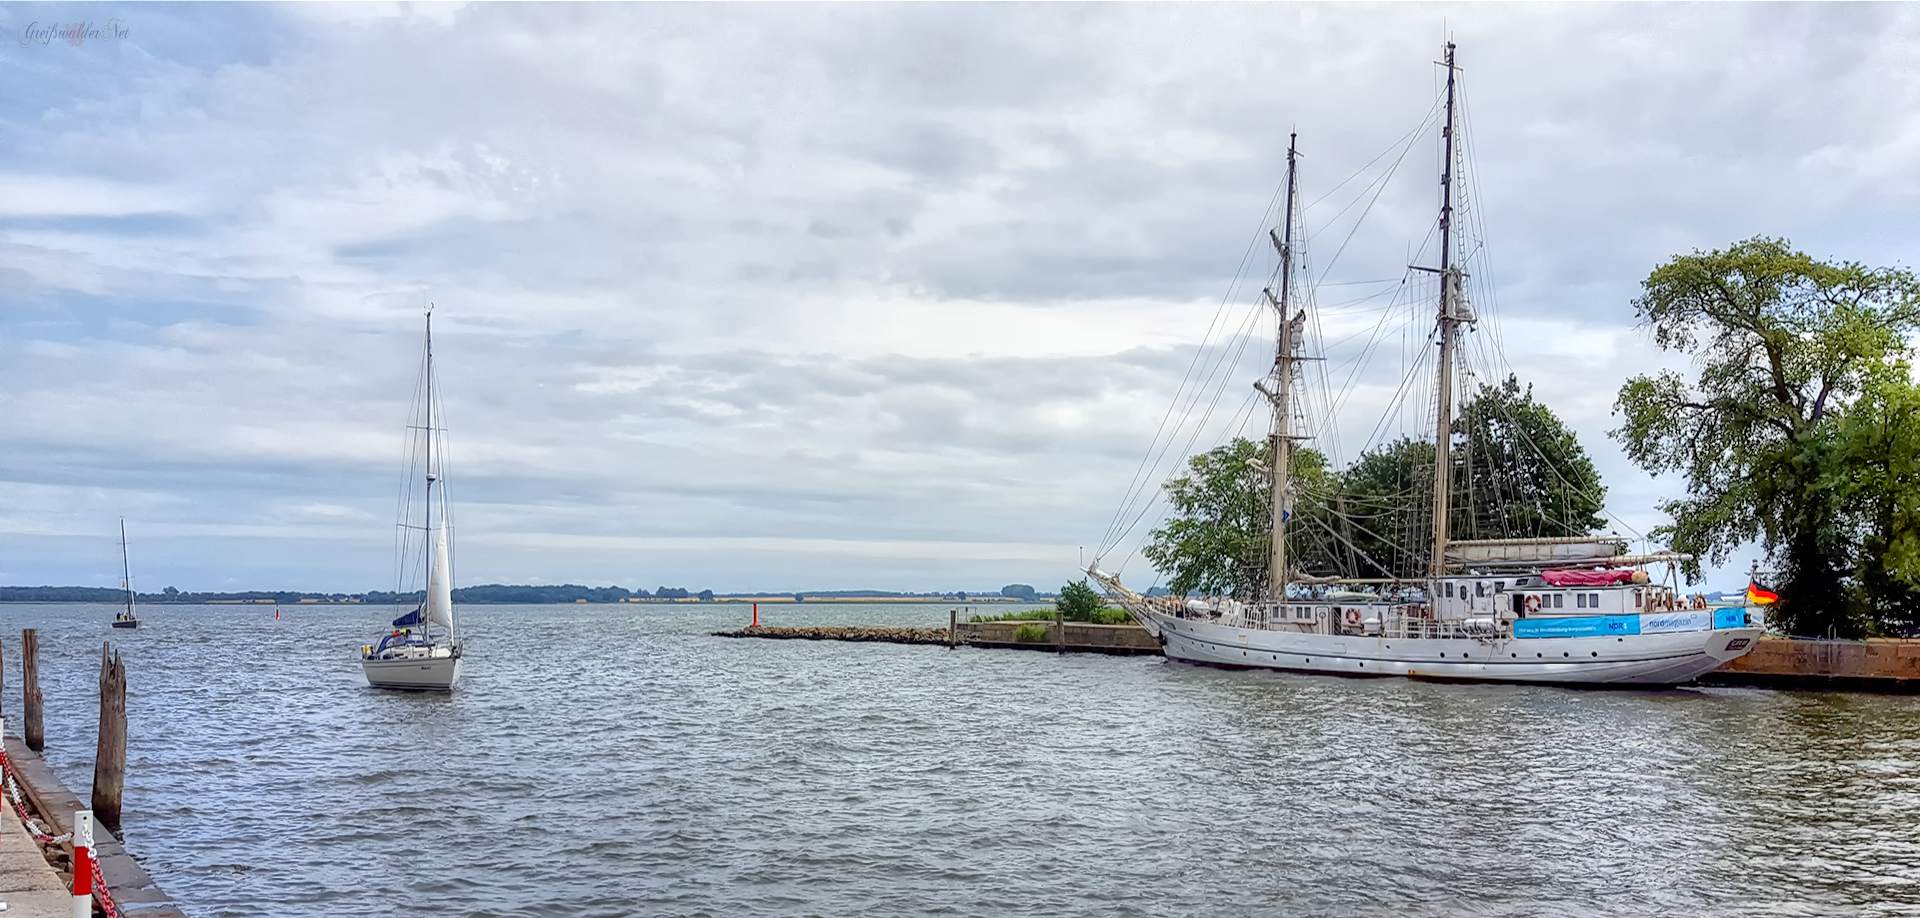 Segelschulschiff GREIF an der Südmole in Greifswald-Wieck